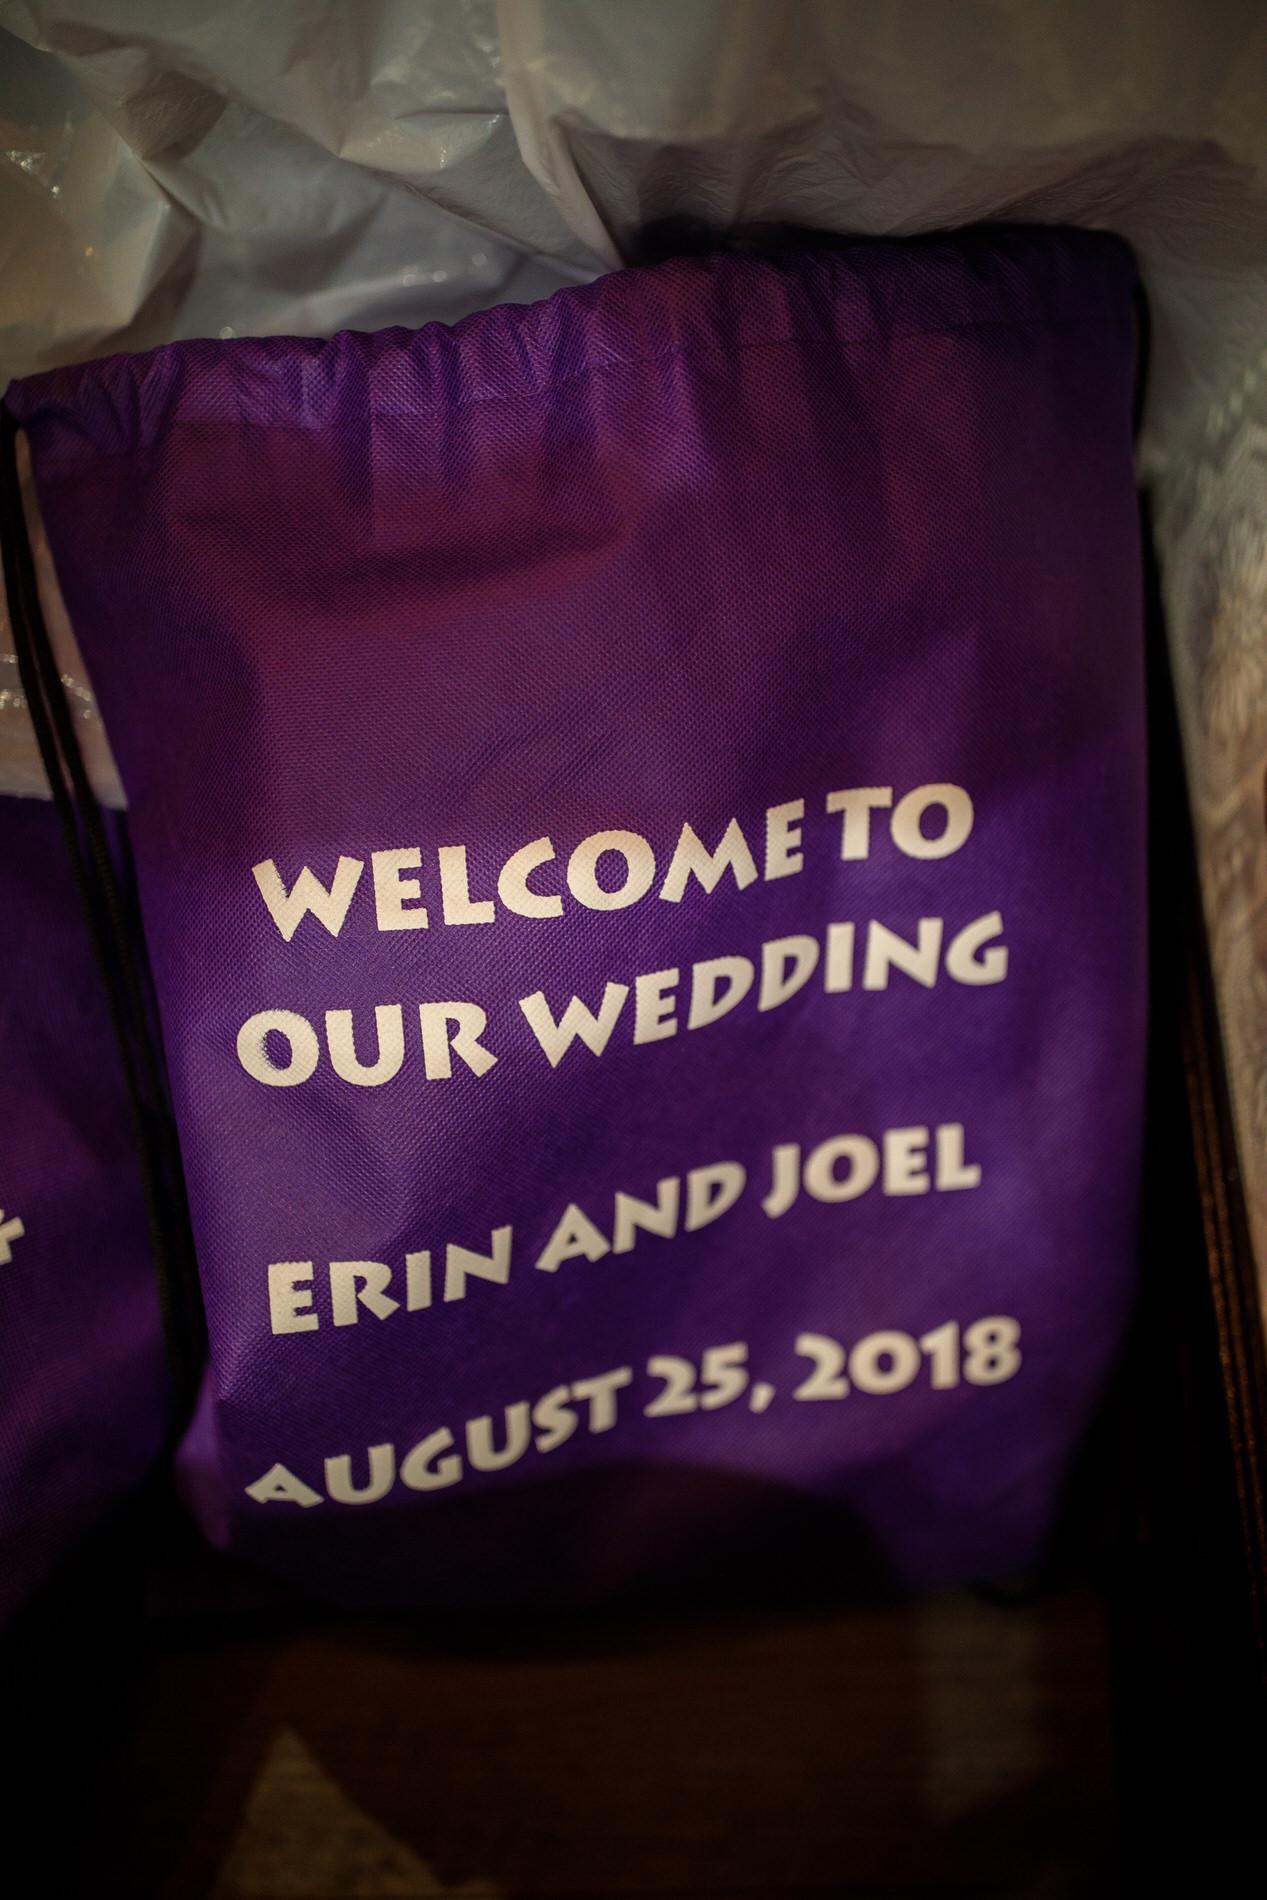 Erin and Joel Web-004.jpg